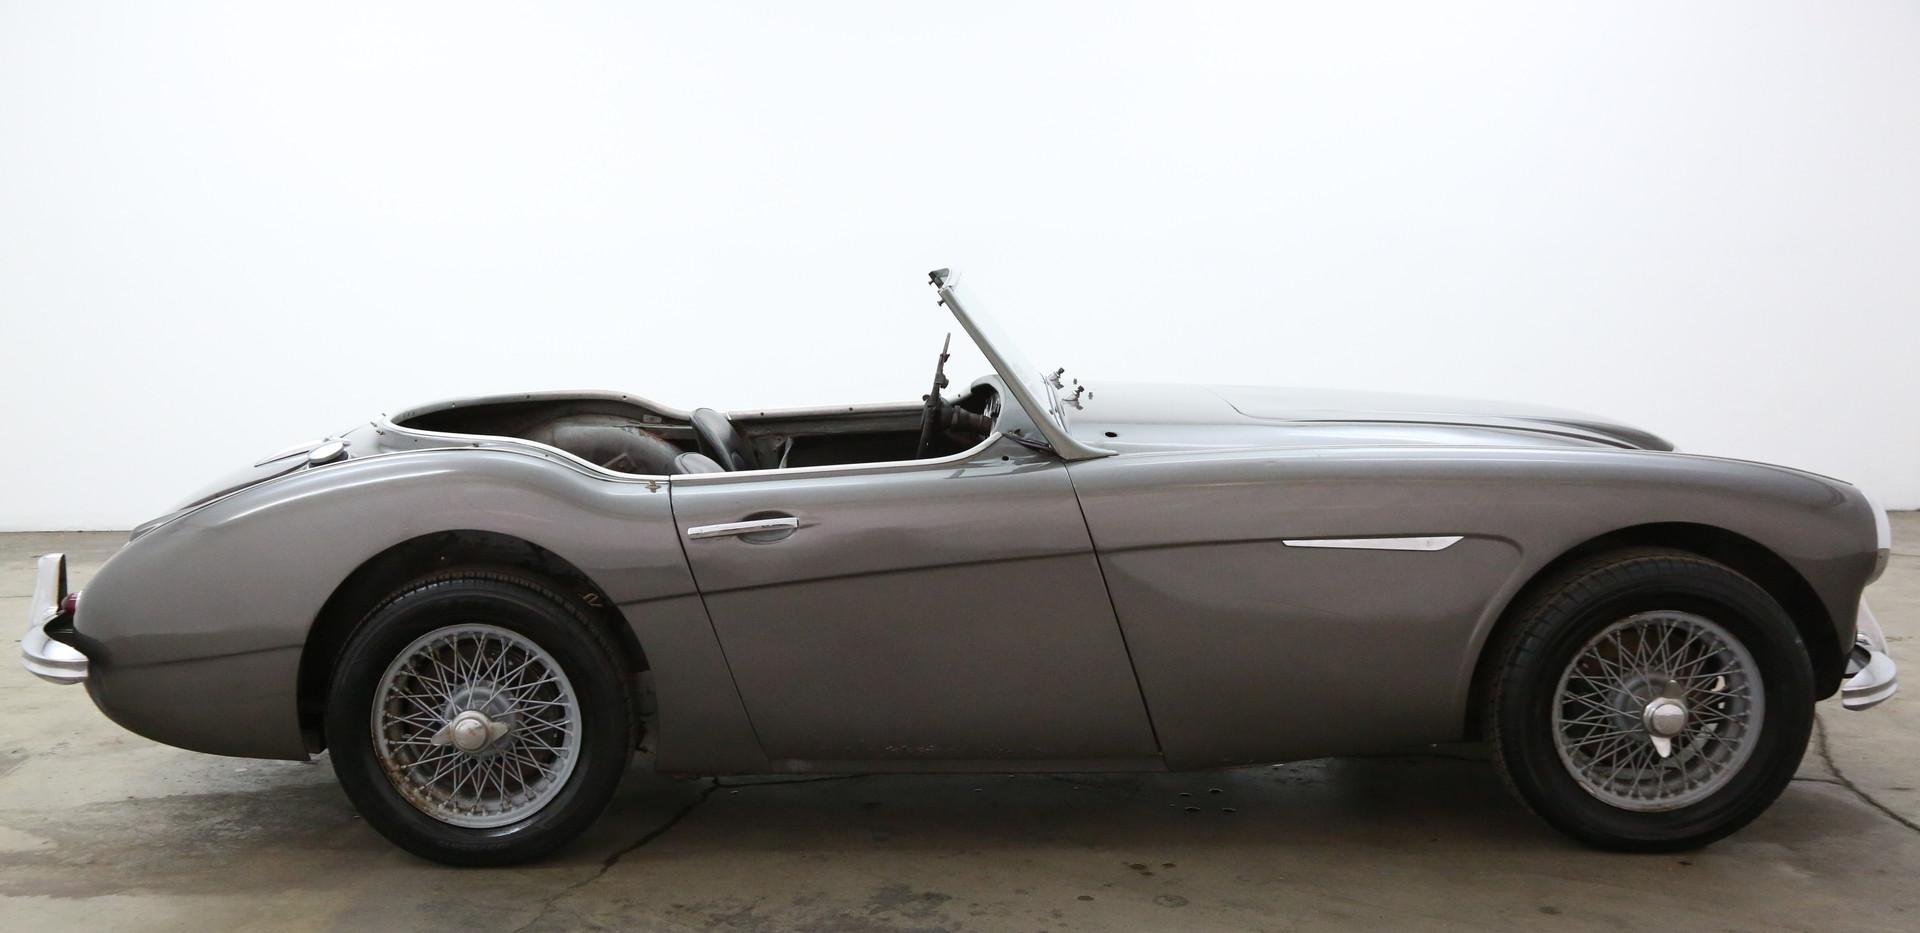 Austin Healey 3000 BT7 / 1962